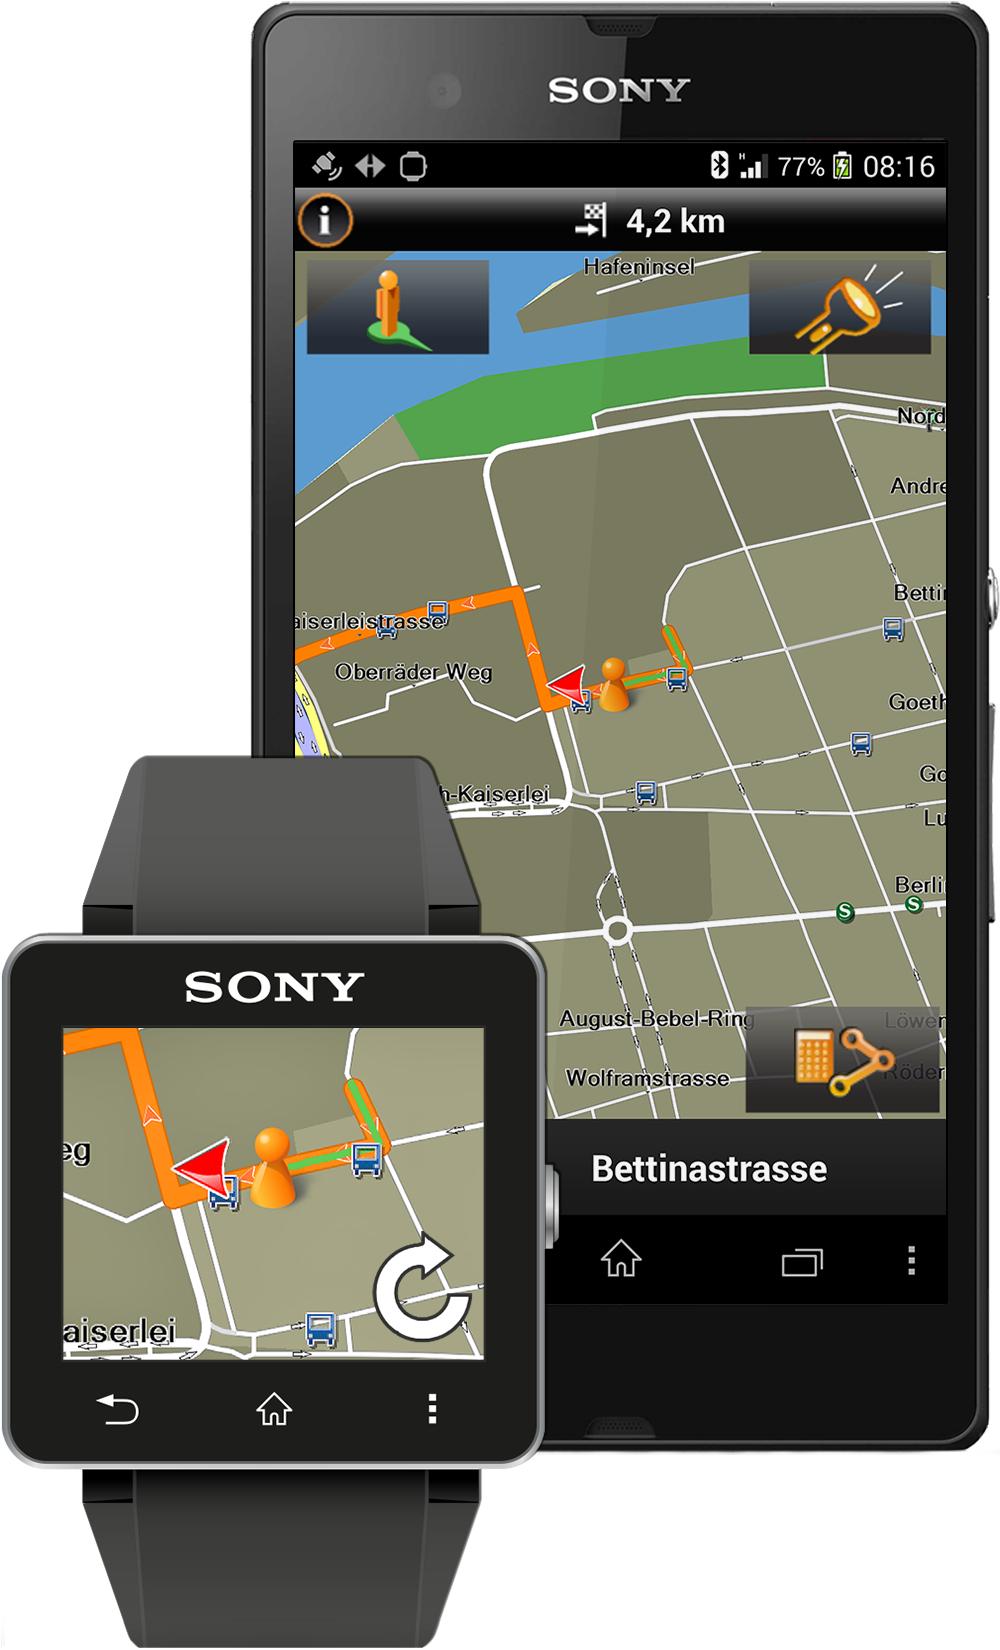 Garmin® Announces Premium Navigation App for Xperia